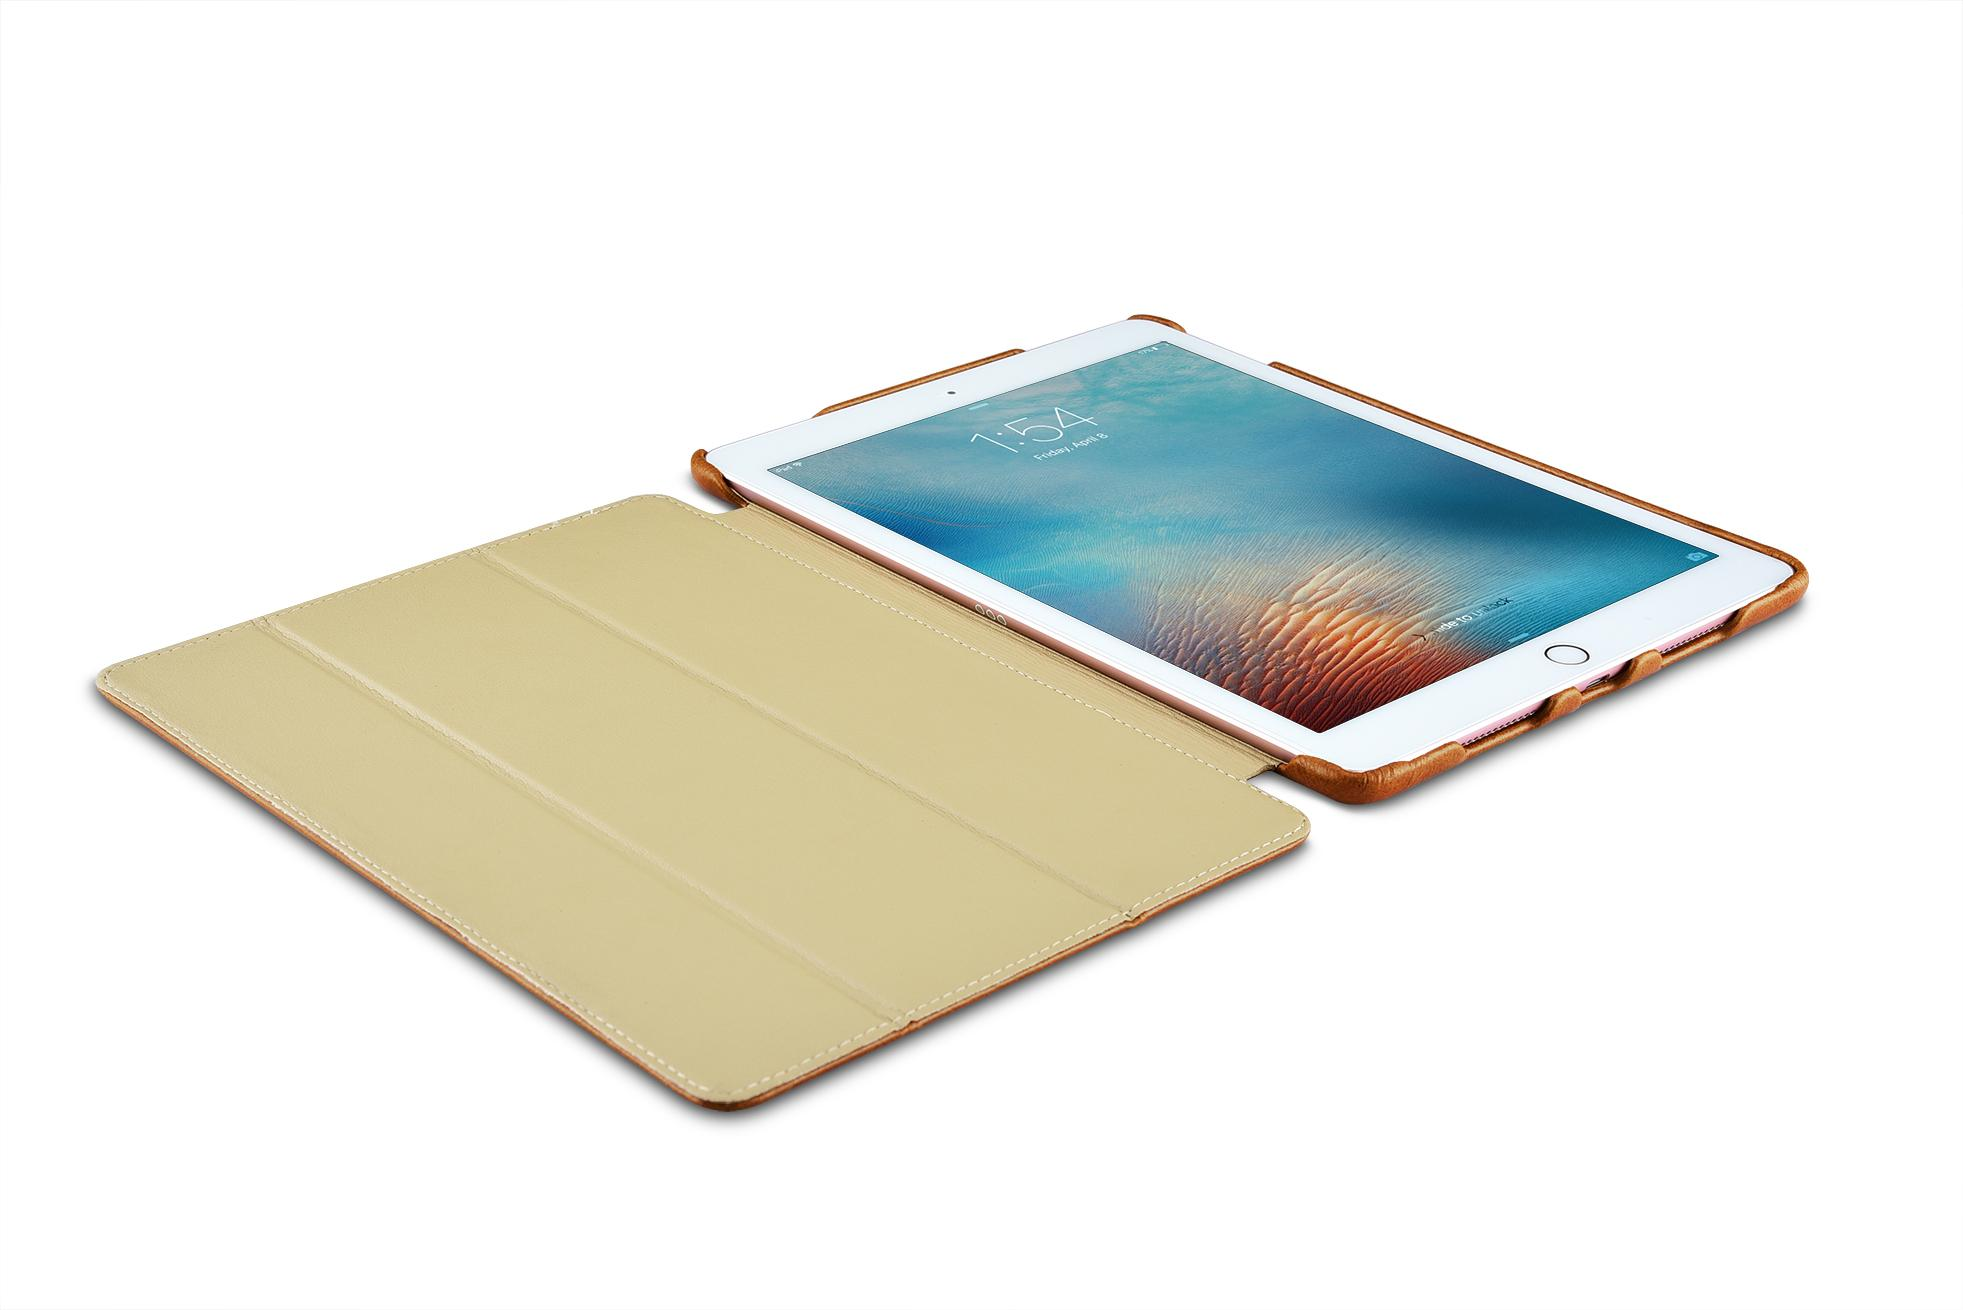 iCarer iPad Pro 9.7 inch Oil Wax Vintage Genuine Leather Folio Case 11